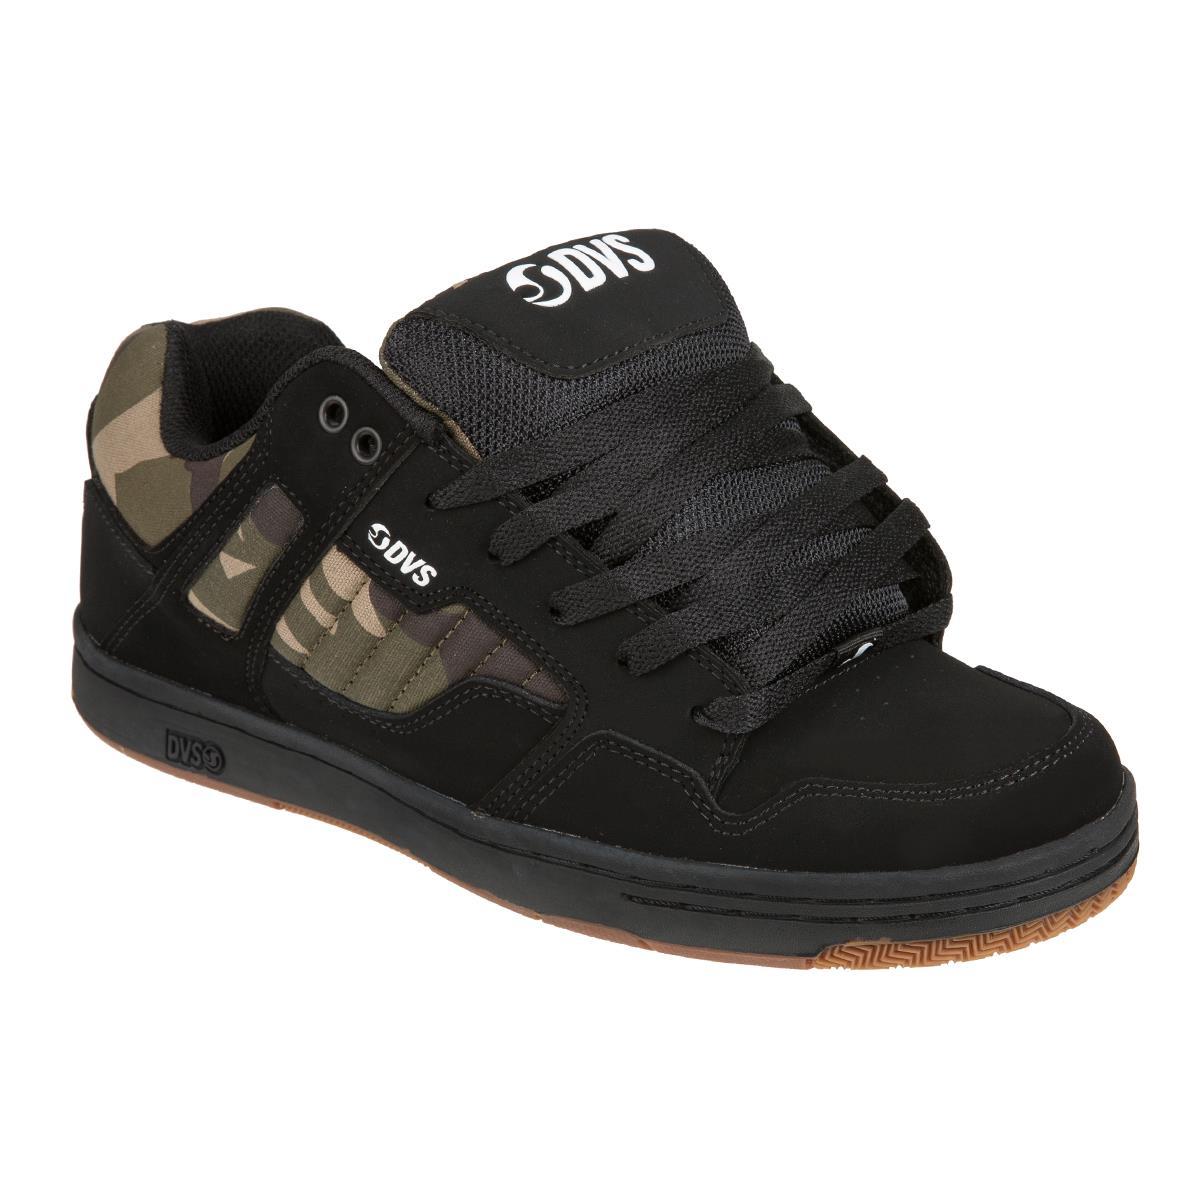 DVS Shoes Enduro 125 Anderson - Black